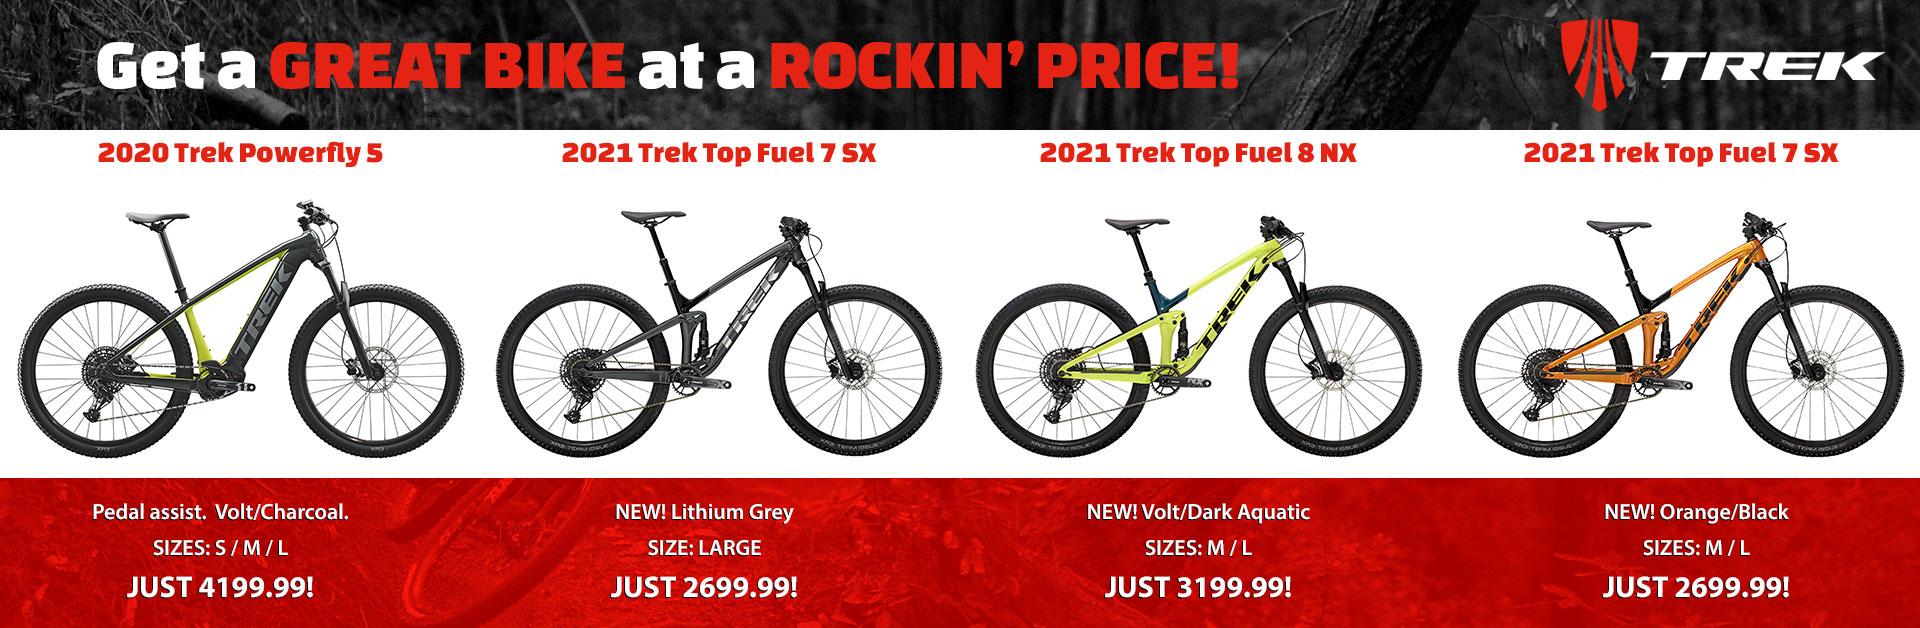 Super Sale on New Trek Bikes!